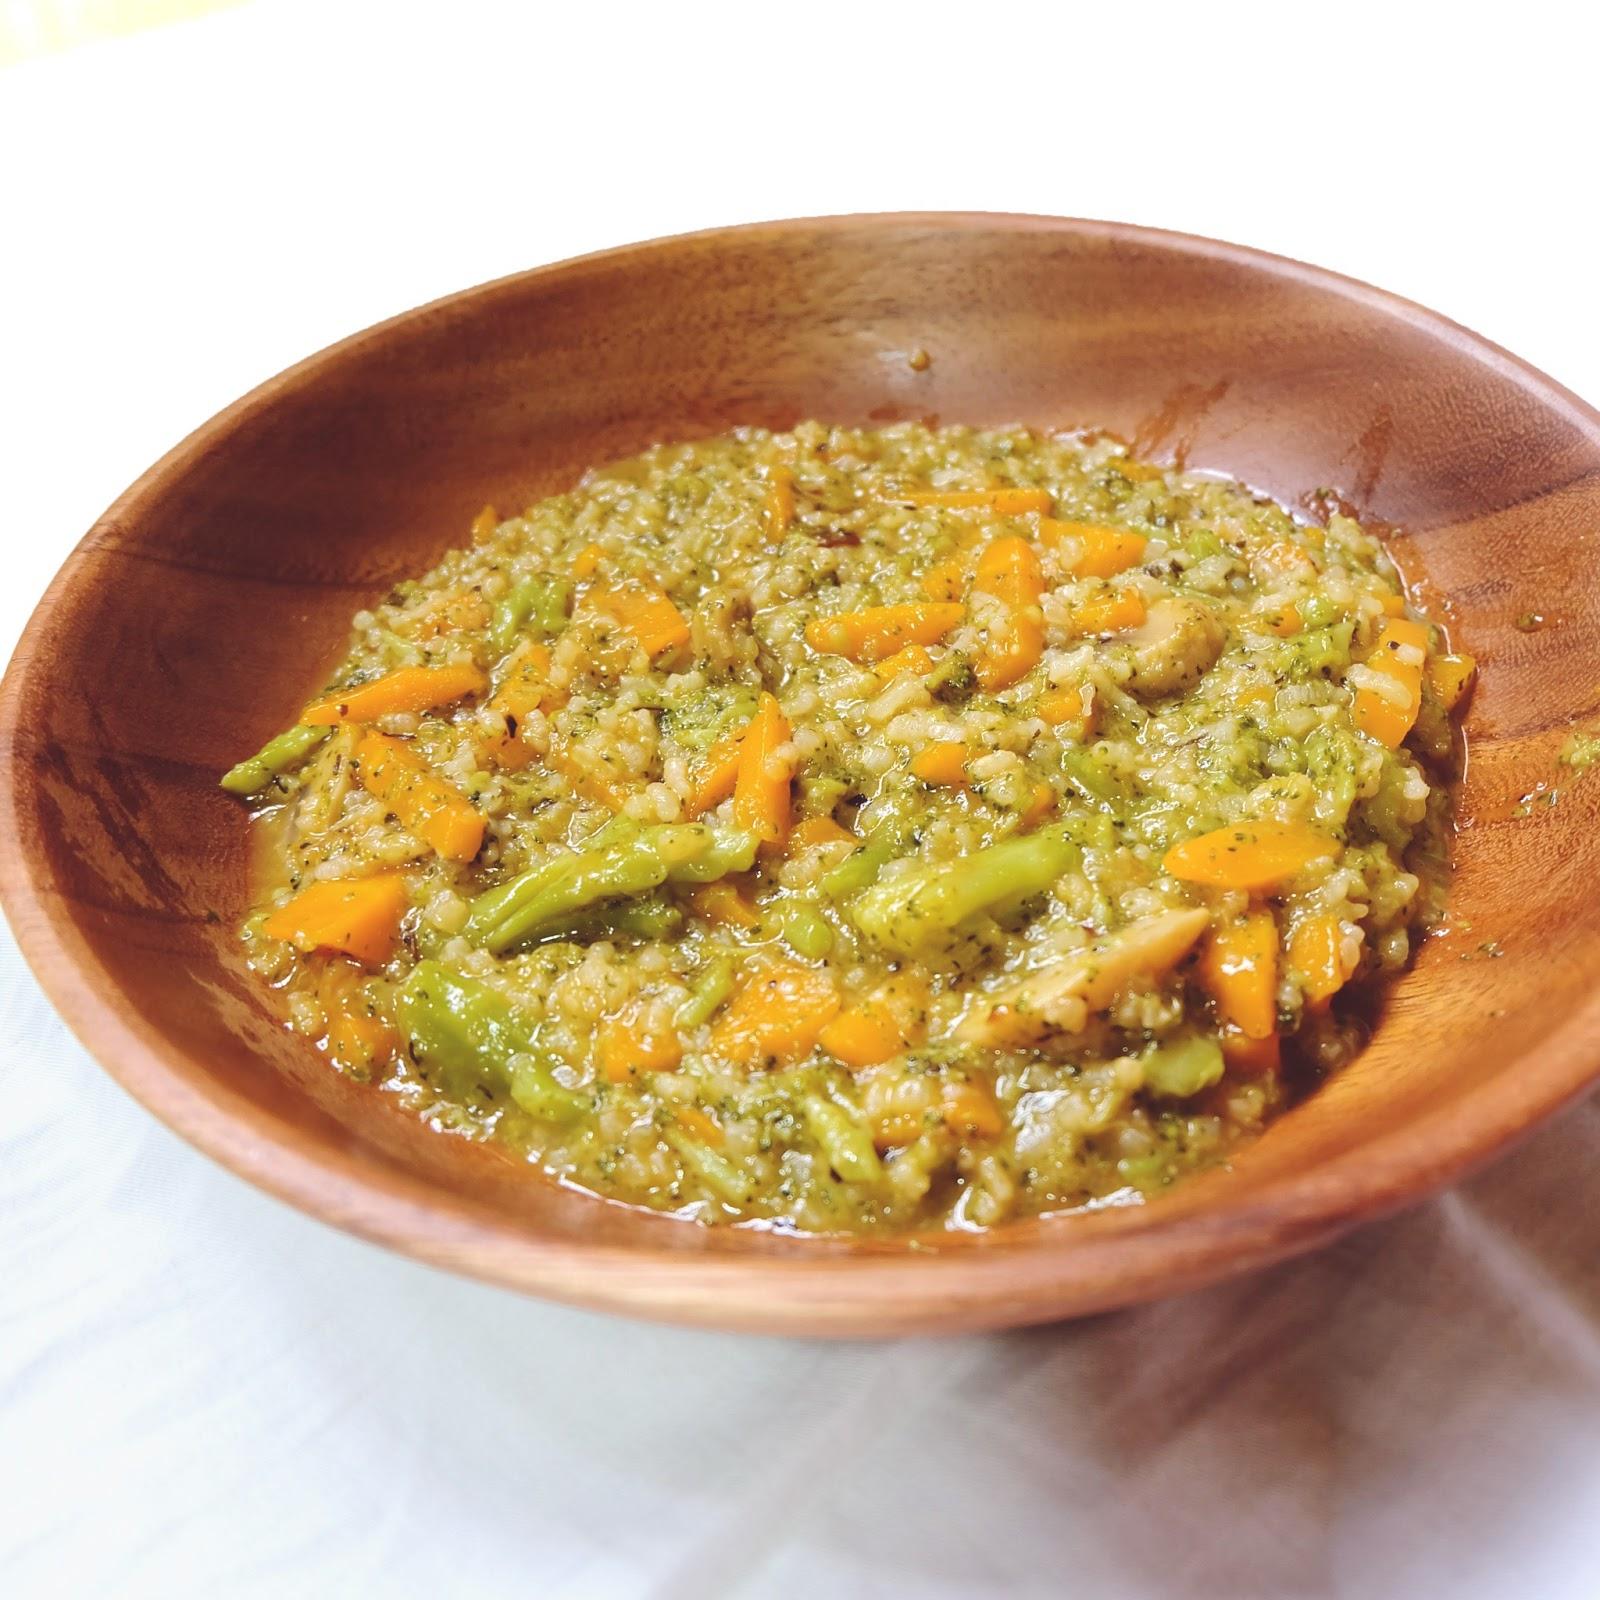 RECIPE: Good Risotto Recipe in Singapore: Parmesan-Carrot ...